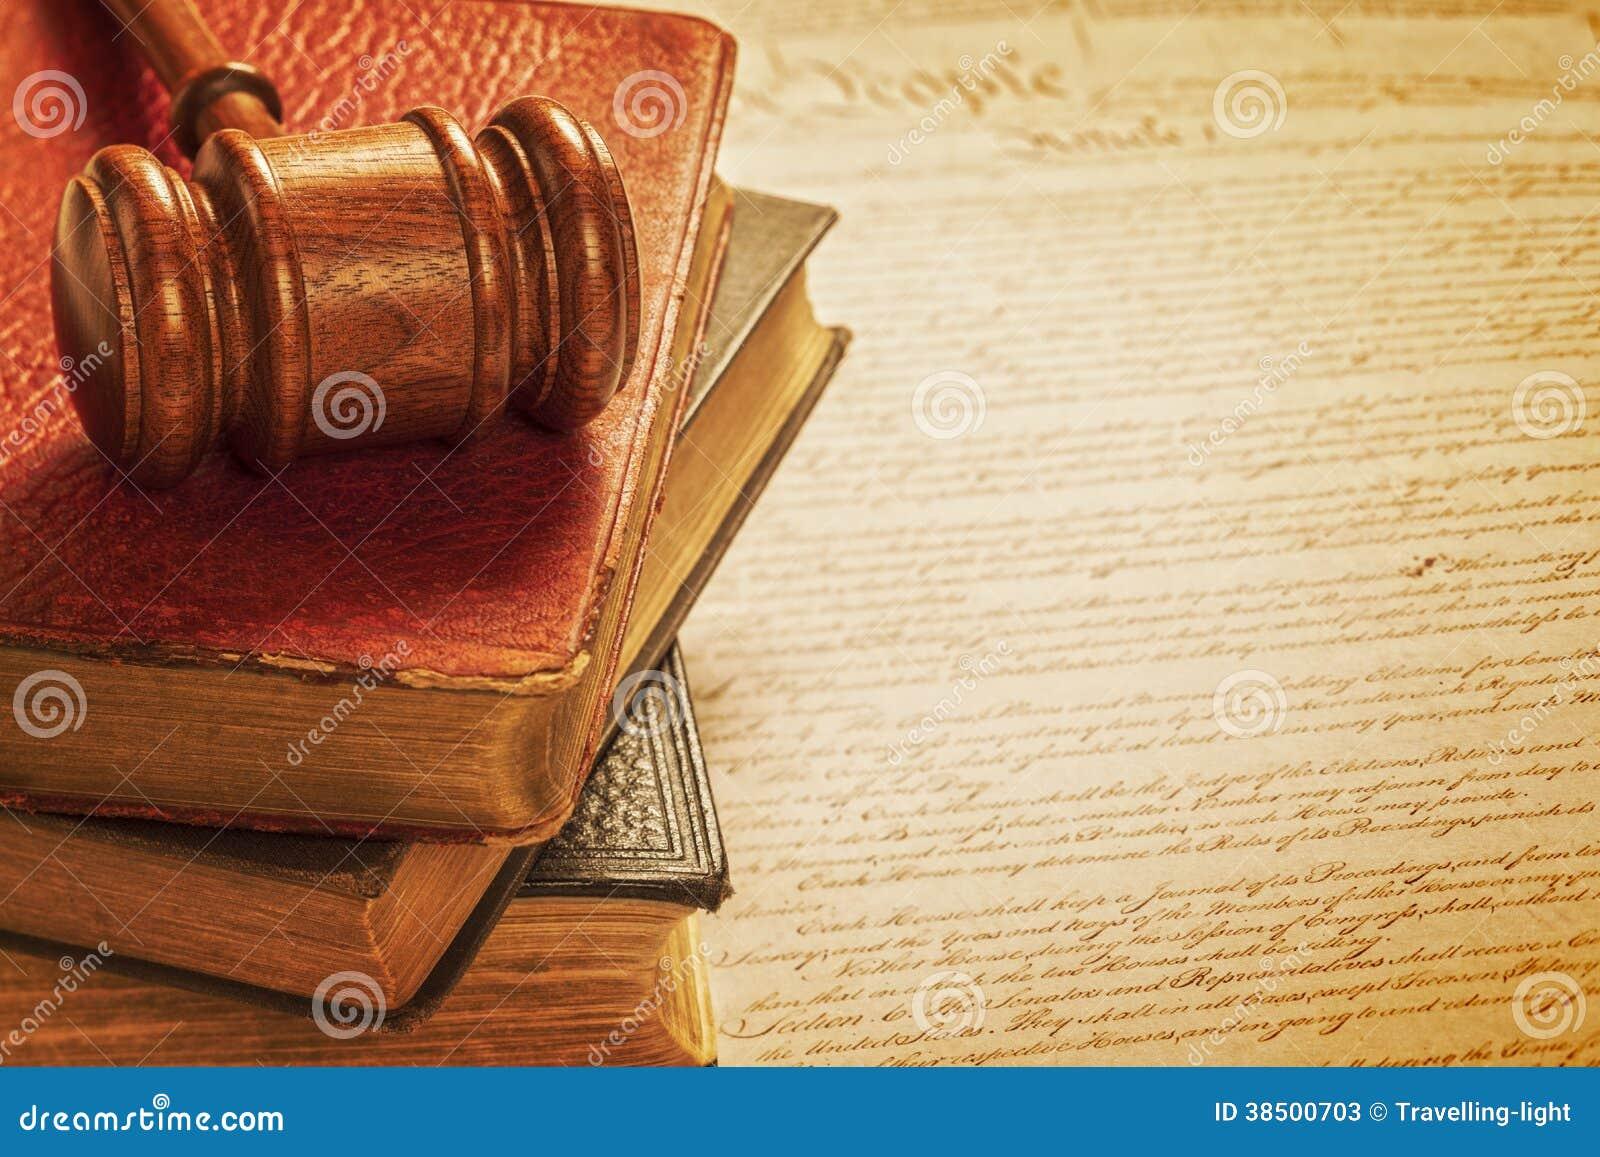 Молоток и концепция правосудия конституции американская